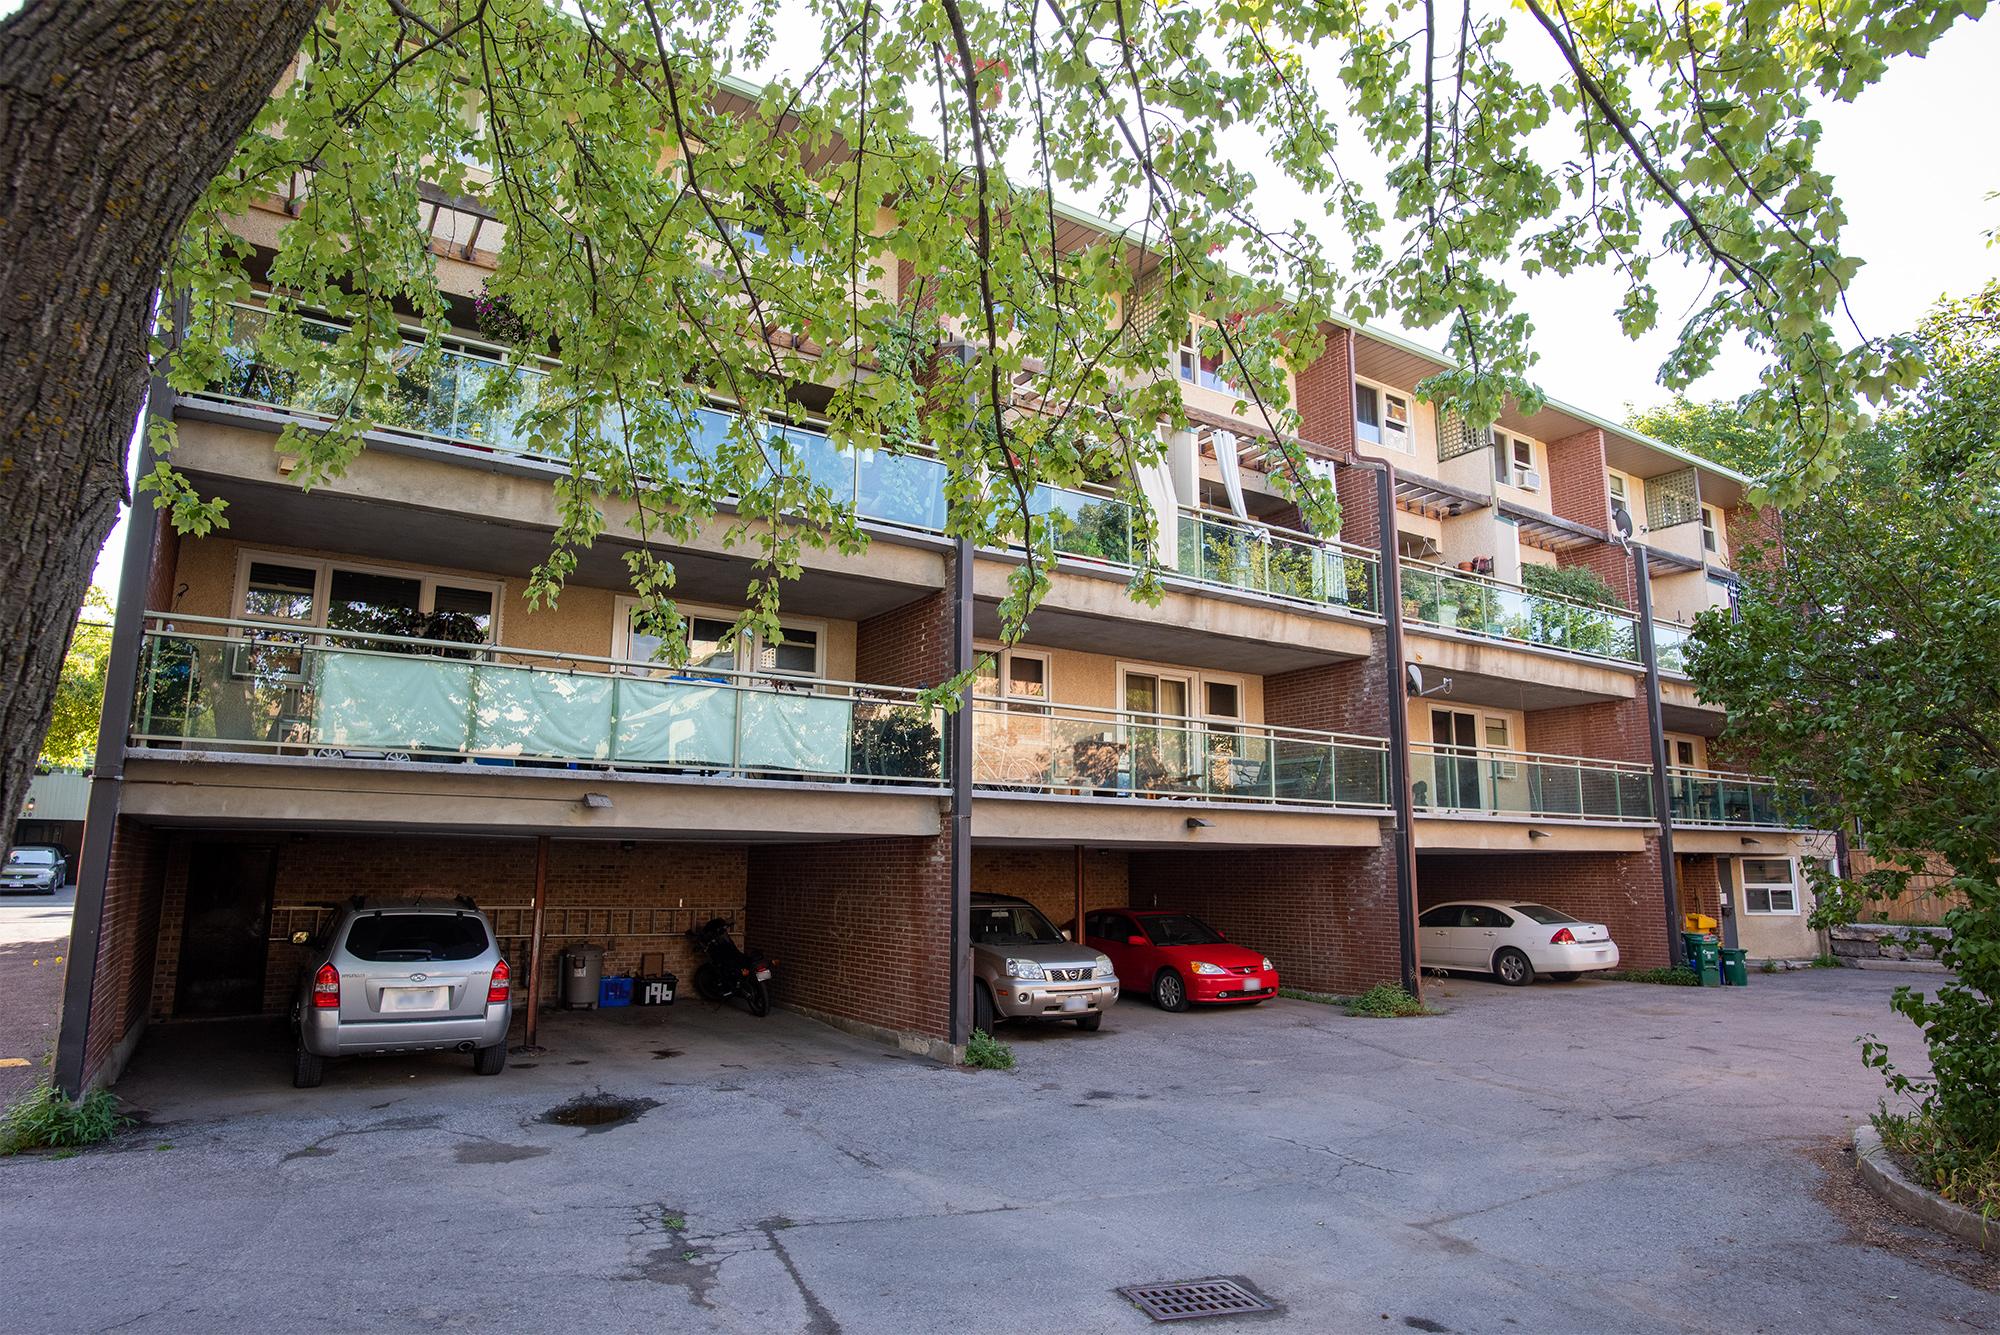 Alex Laidlaw Housing Co-operative